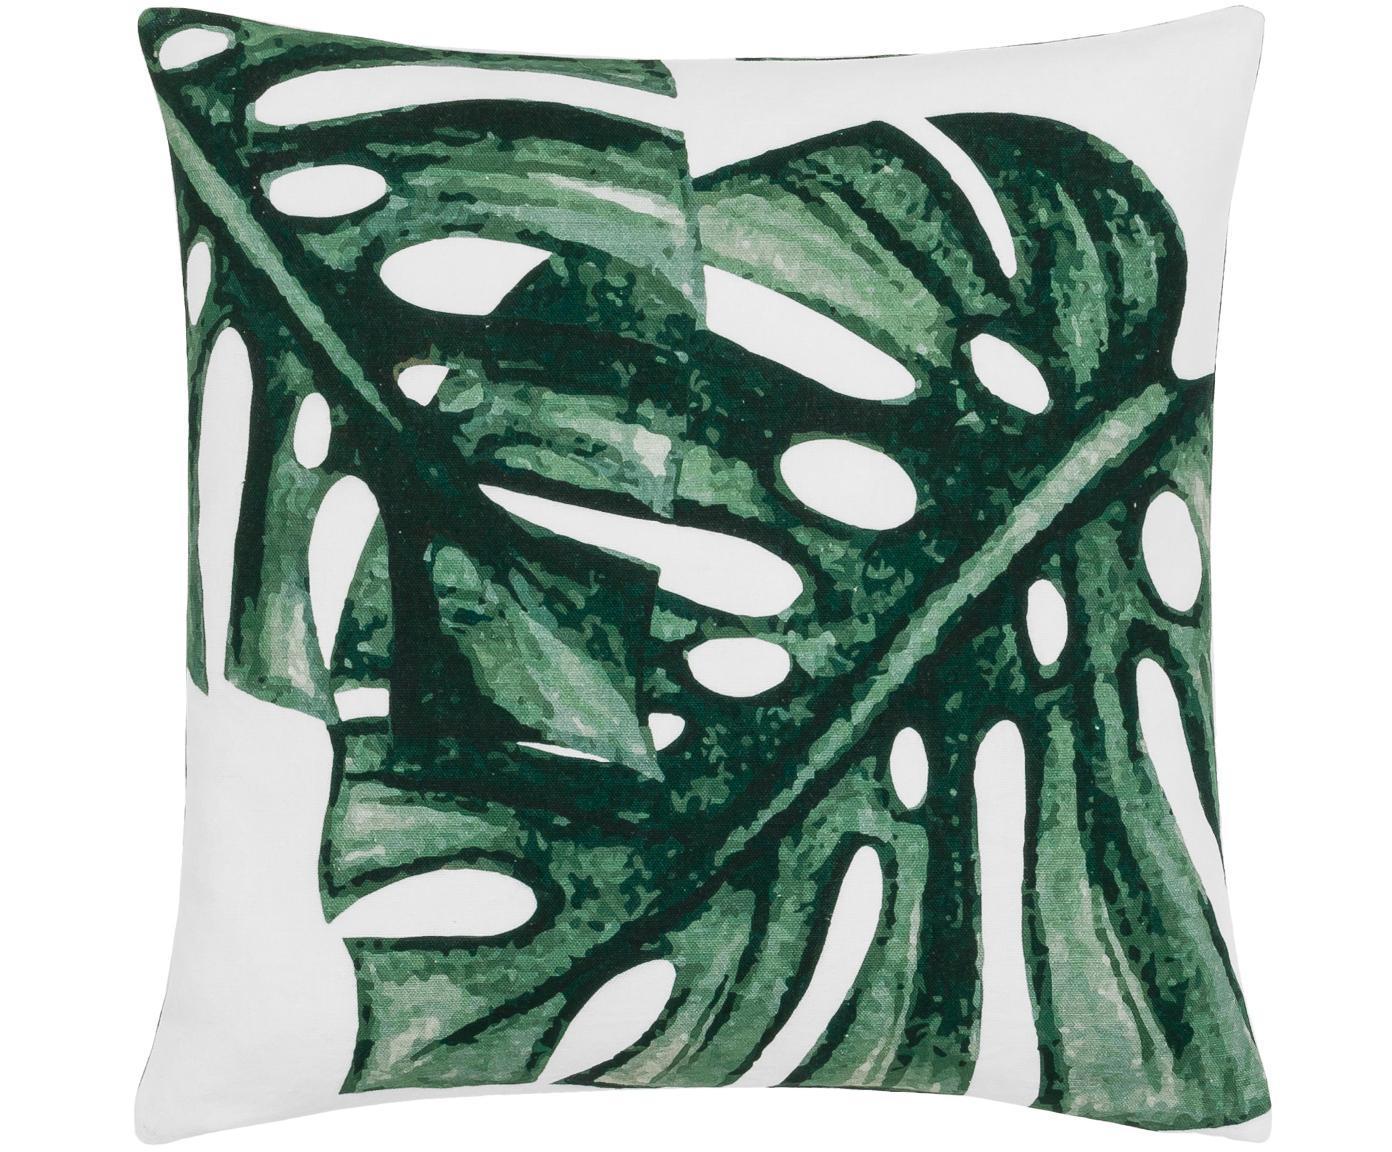 Kissenhülle Tropics mit Monstera Print in Grün/Weiss, 100% Baumwolle, Grün, Weiss, 40 x 40 cm